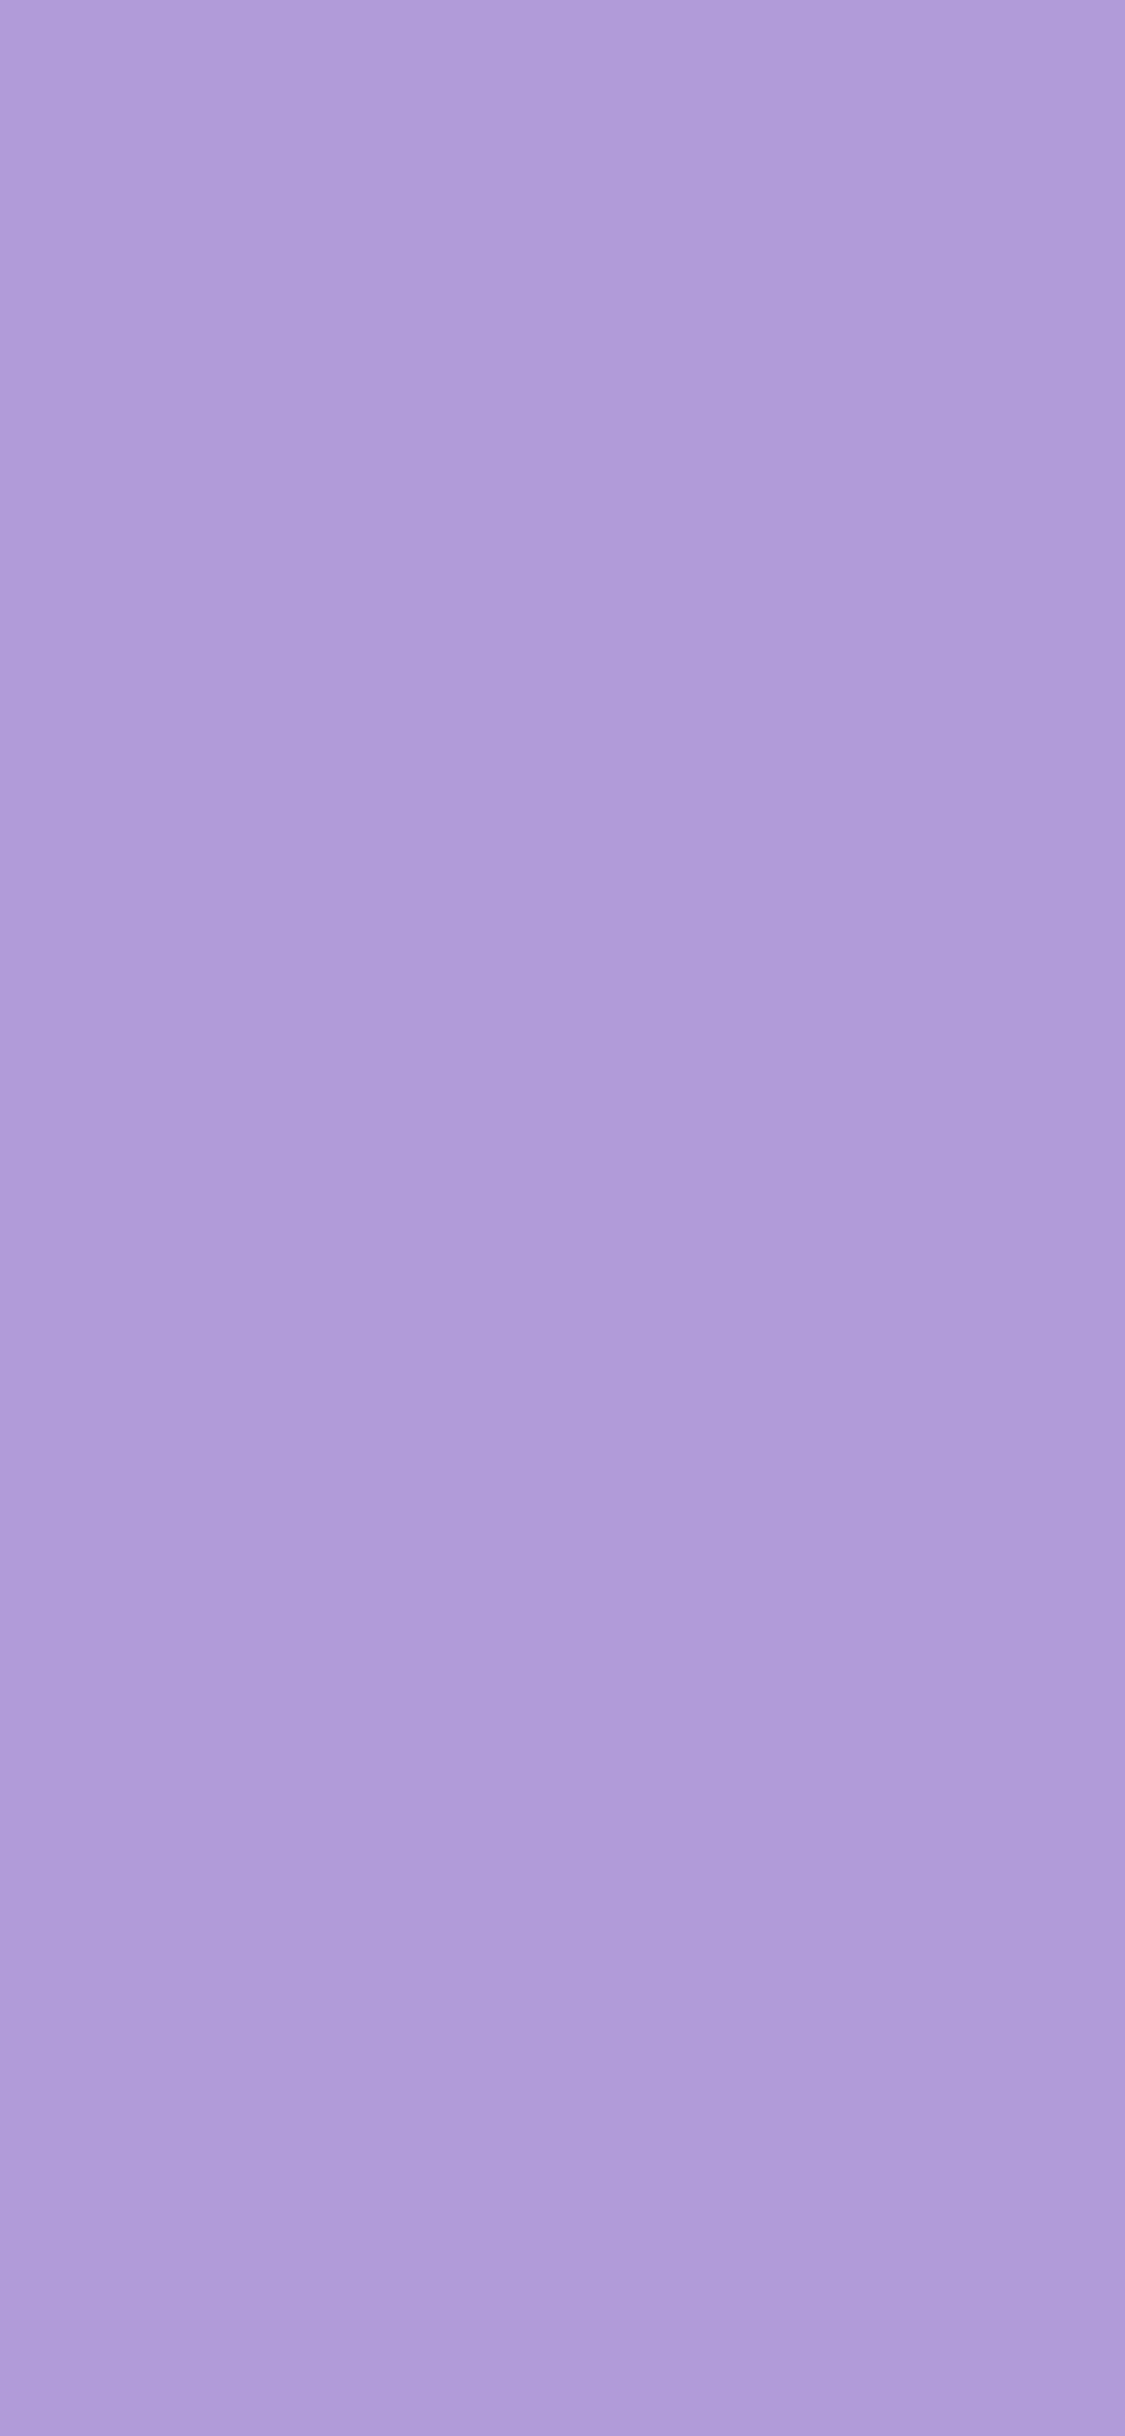 1125x2436 Light Pastel Purple Solid Color Background